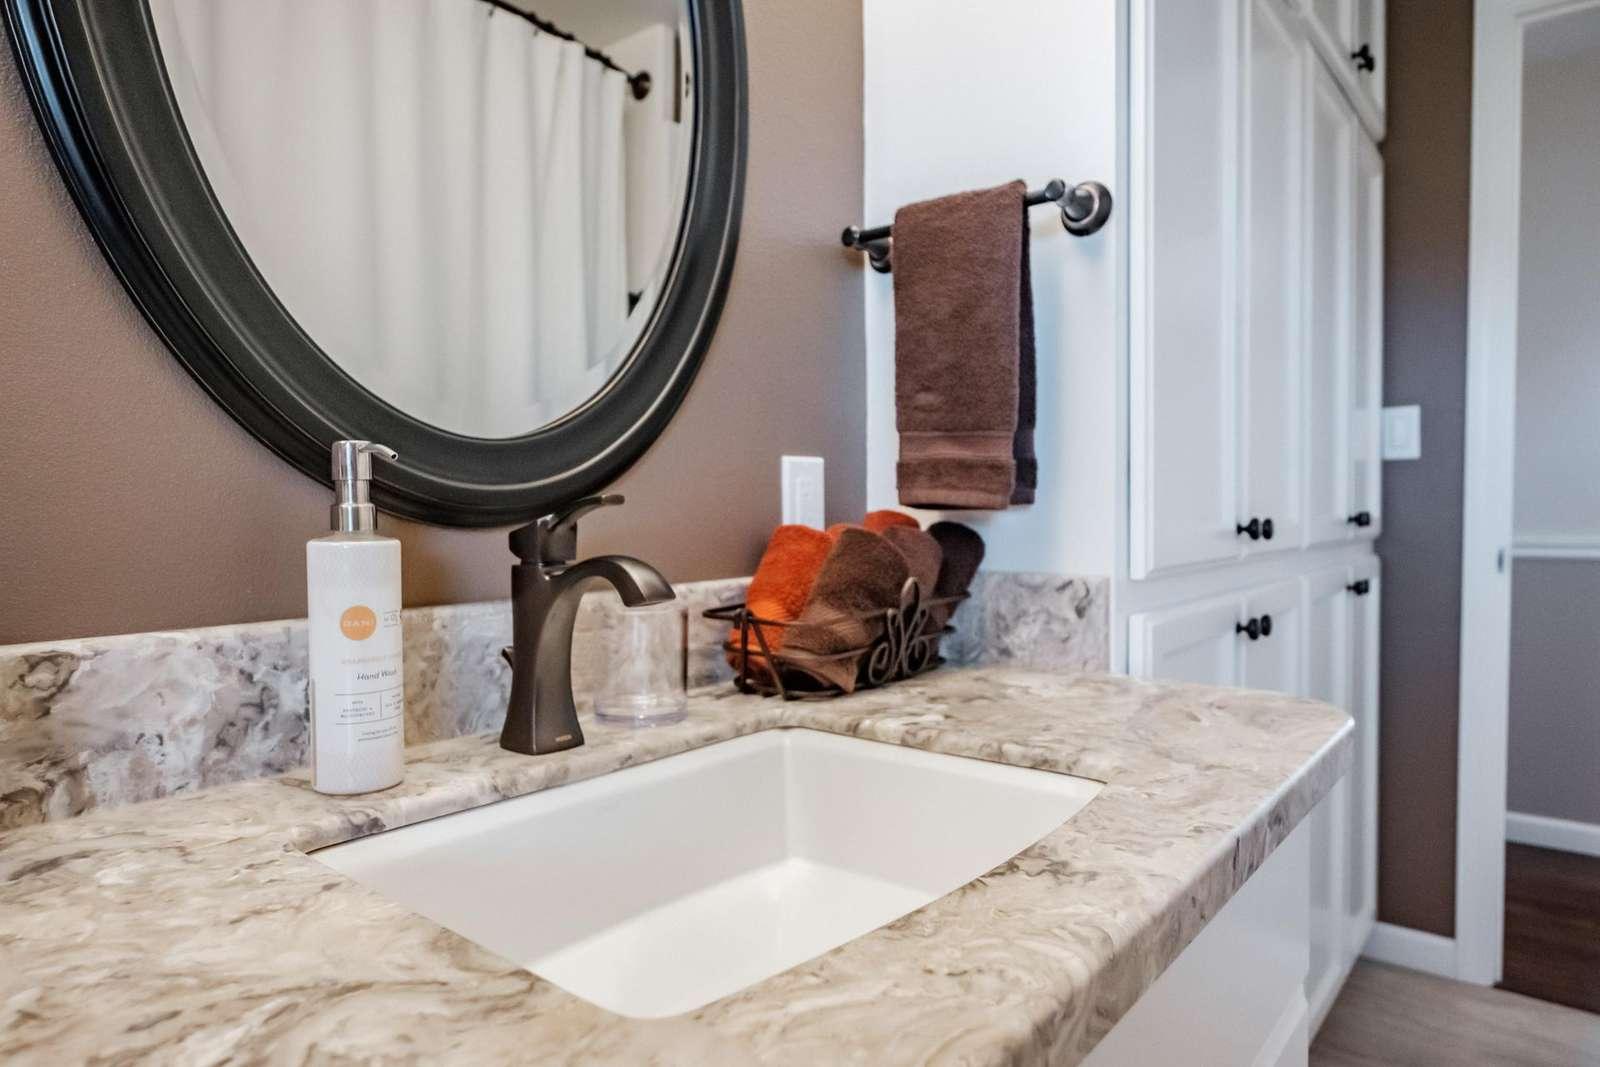 Bathroom - each sink has similar amenities